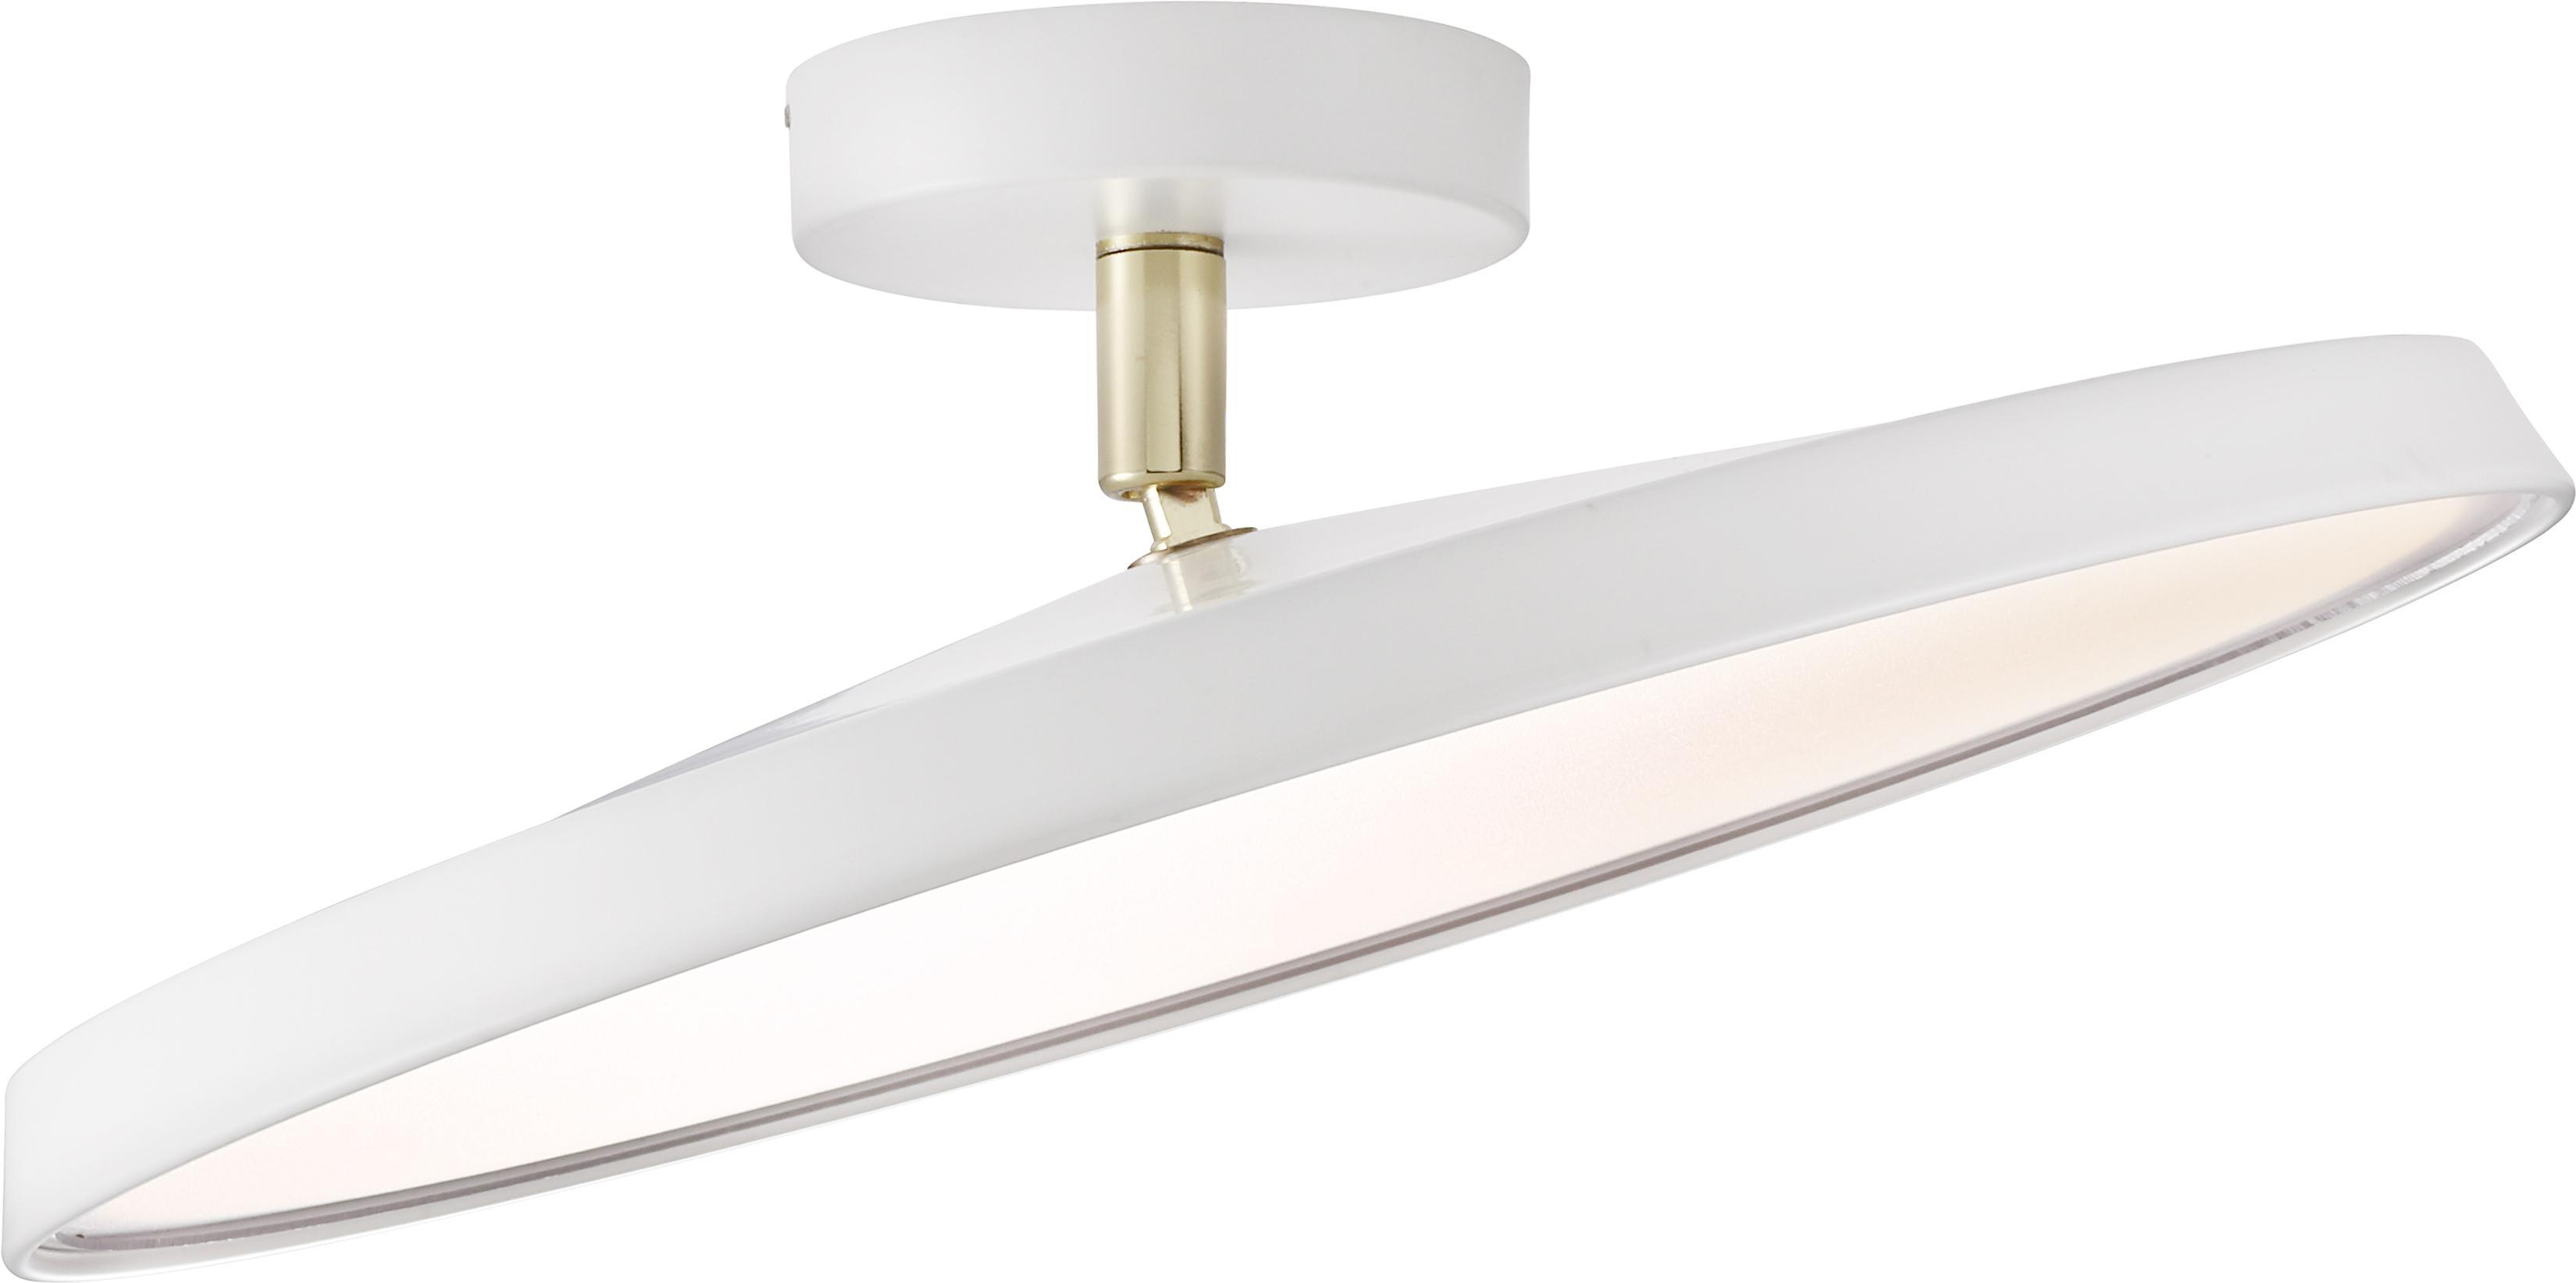 Plafoniera a LED in bianco Alba, Paralume: alluminio, Bianco, Ø 40 x Alt. 12 cm